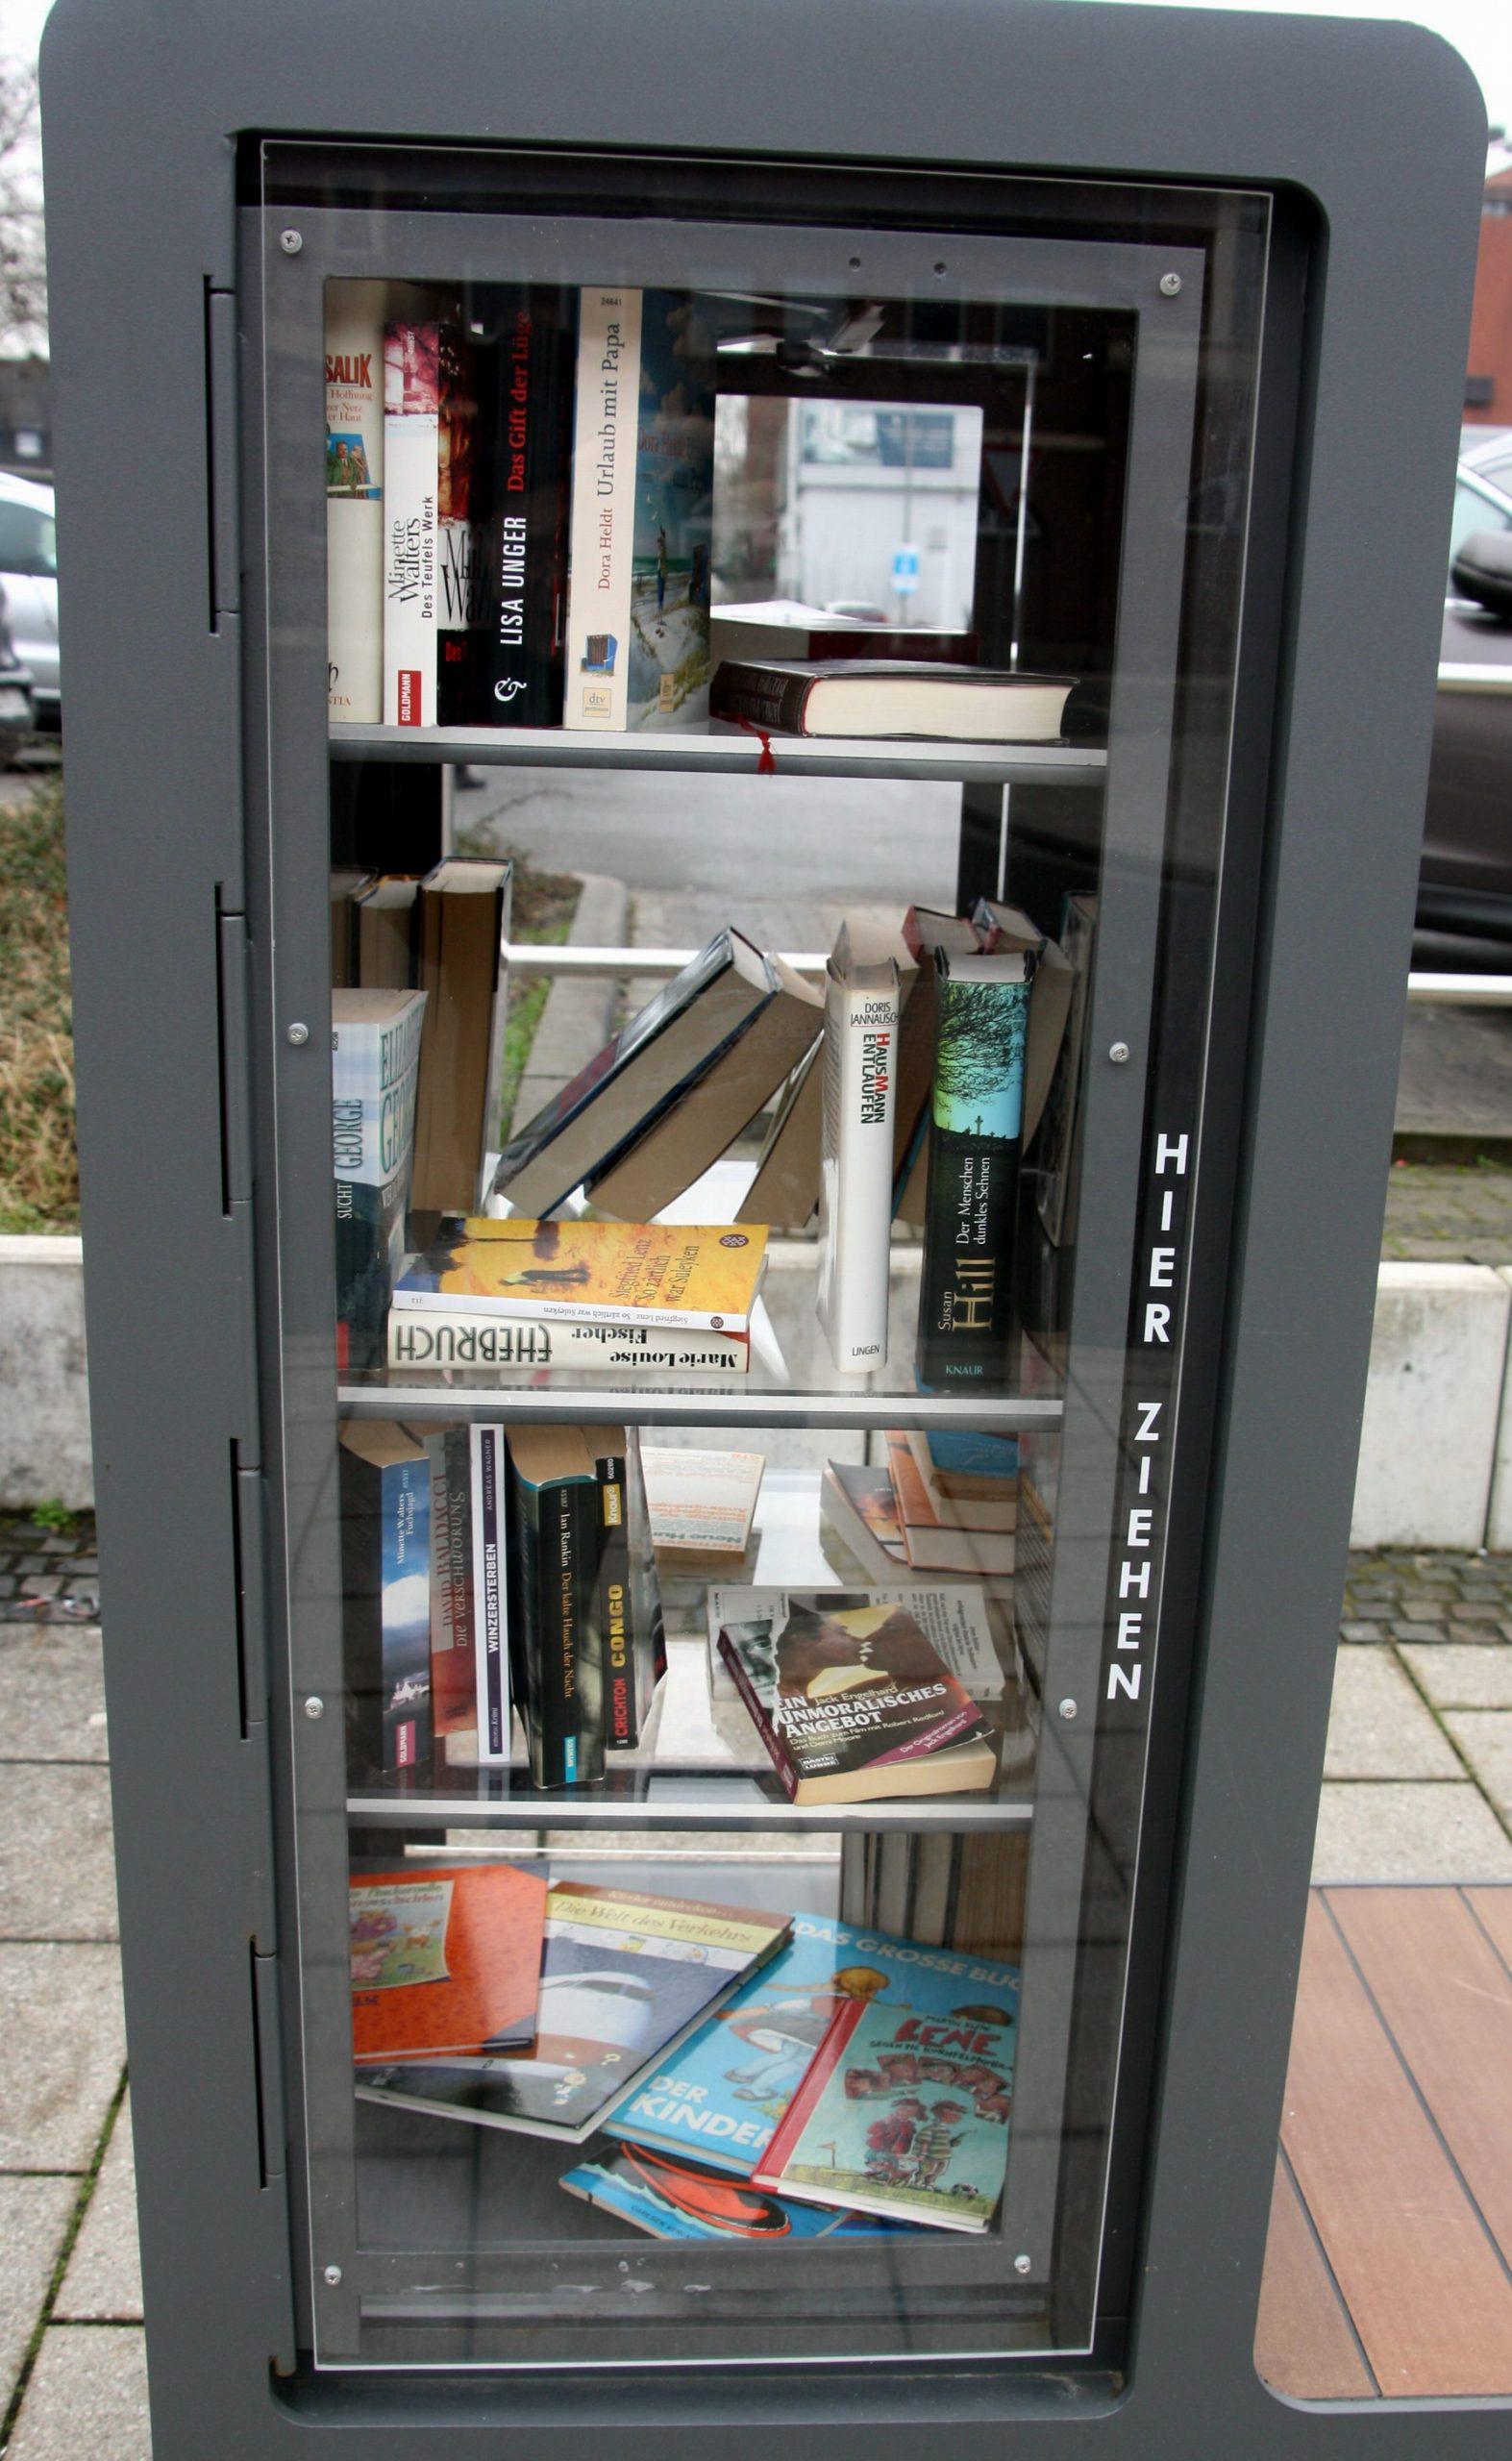 HV-Bücherschrank-21-2449